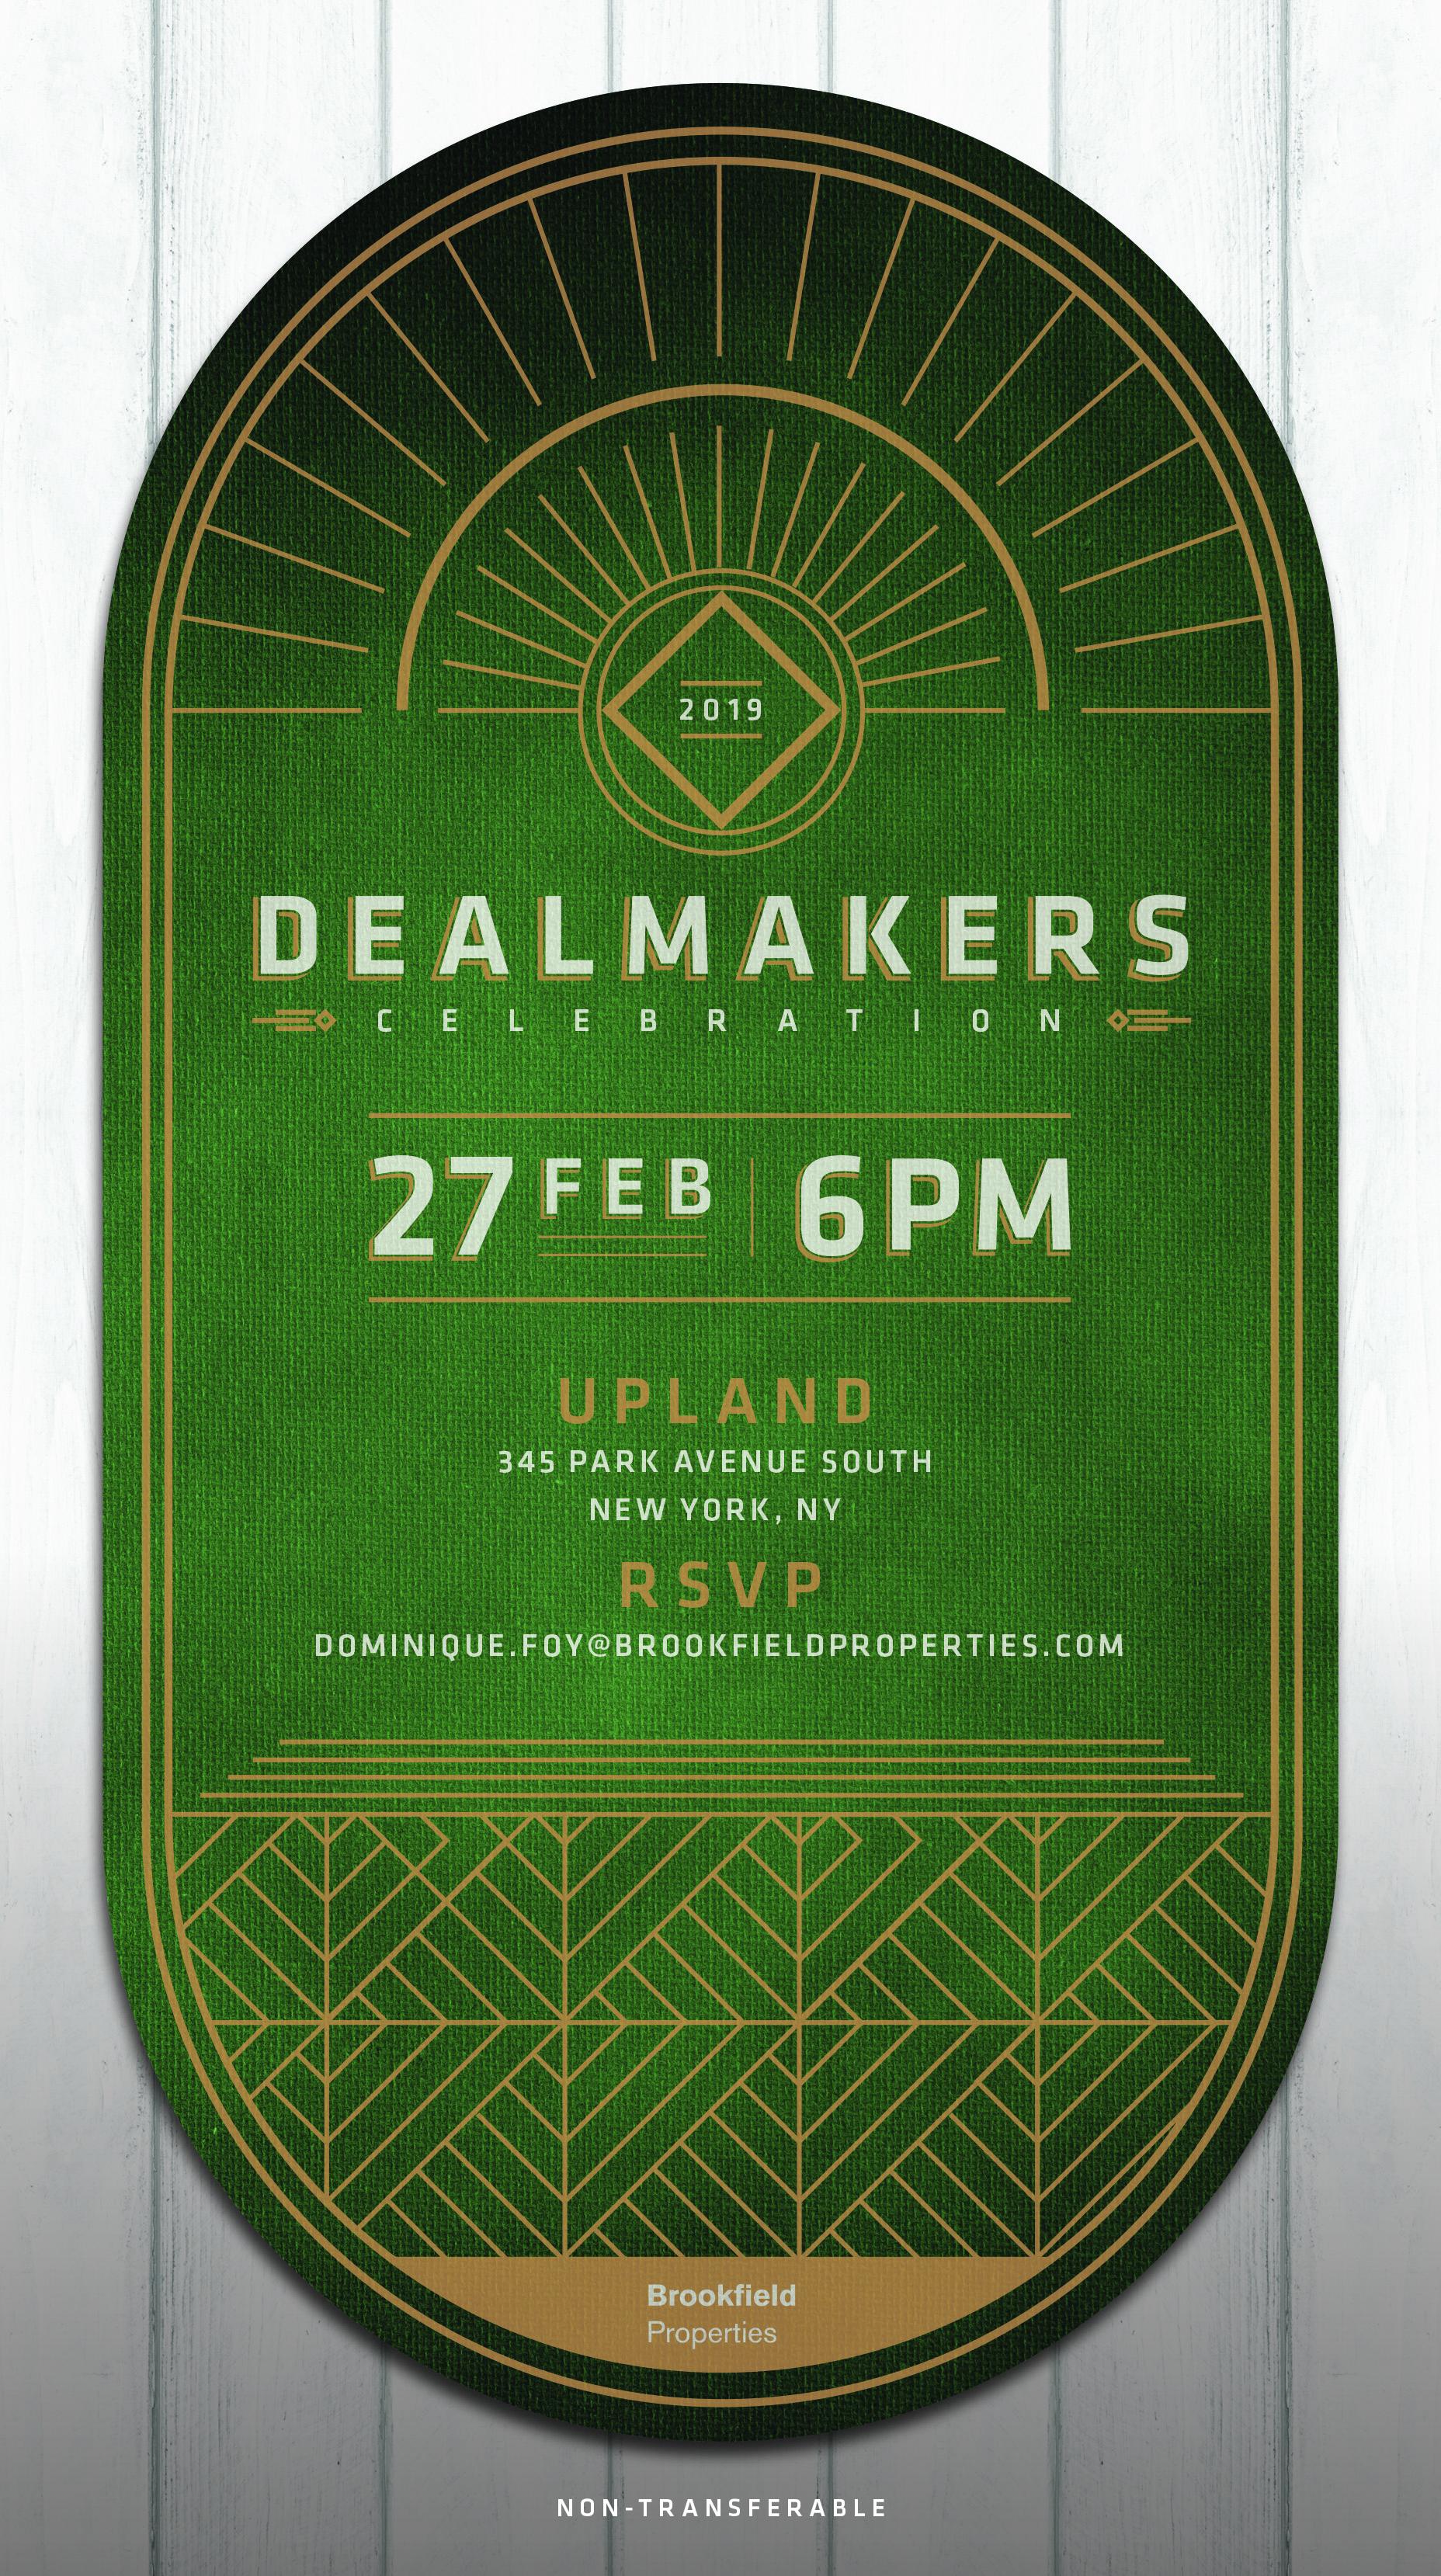 New York Dealmakers Invitation